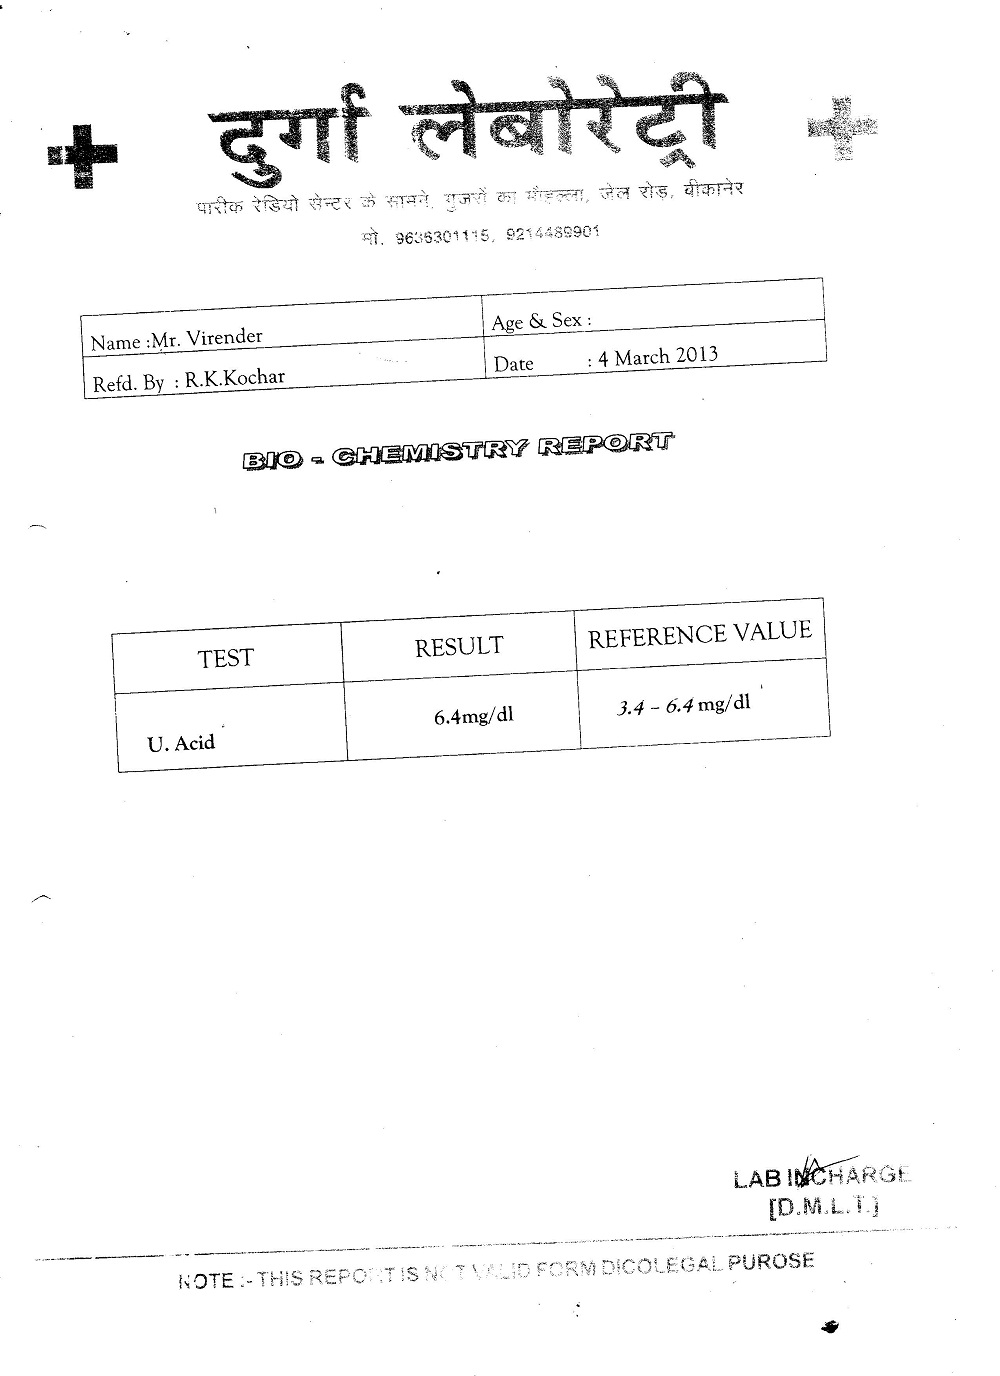 virendra-tak-azospermia-9